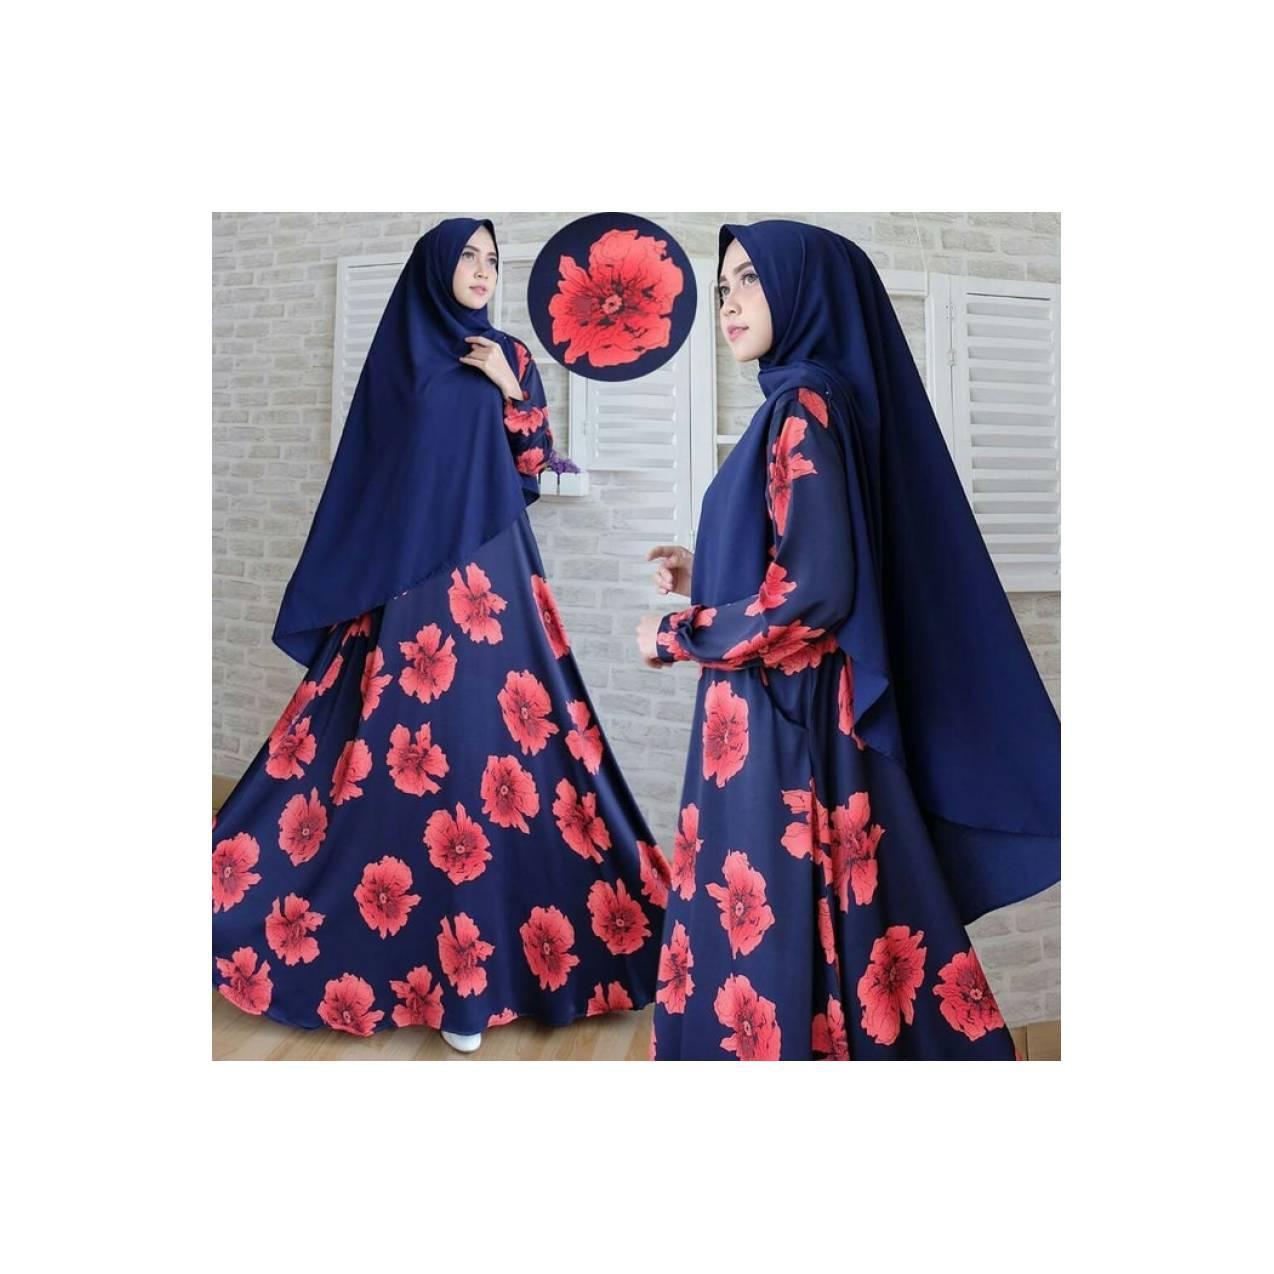 Baju Pengantin Muslimah 120238 GAMIS WANITA ZANITHA SYARI NAVY